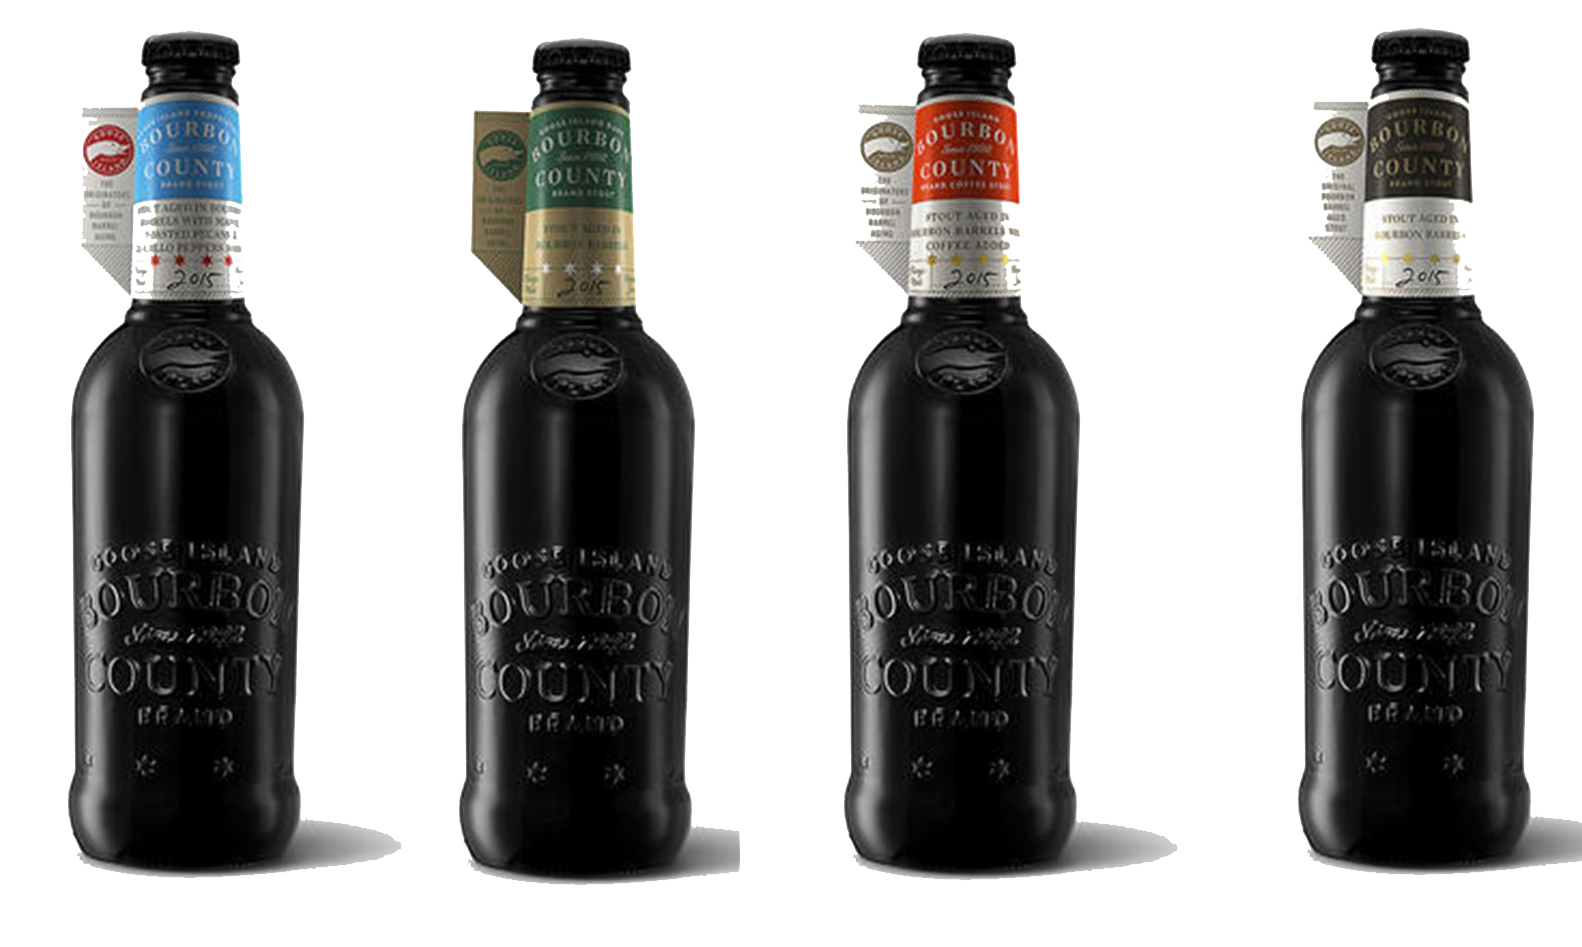 goose island bourbon county stout _1